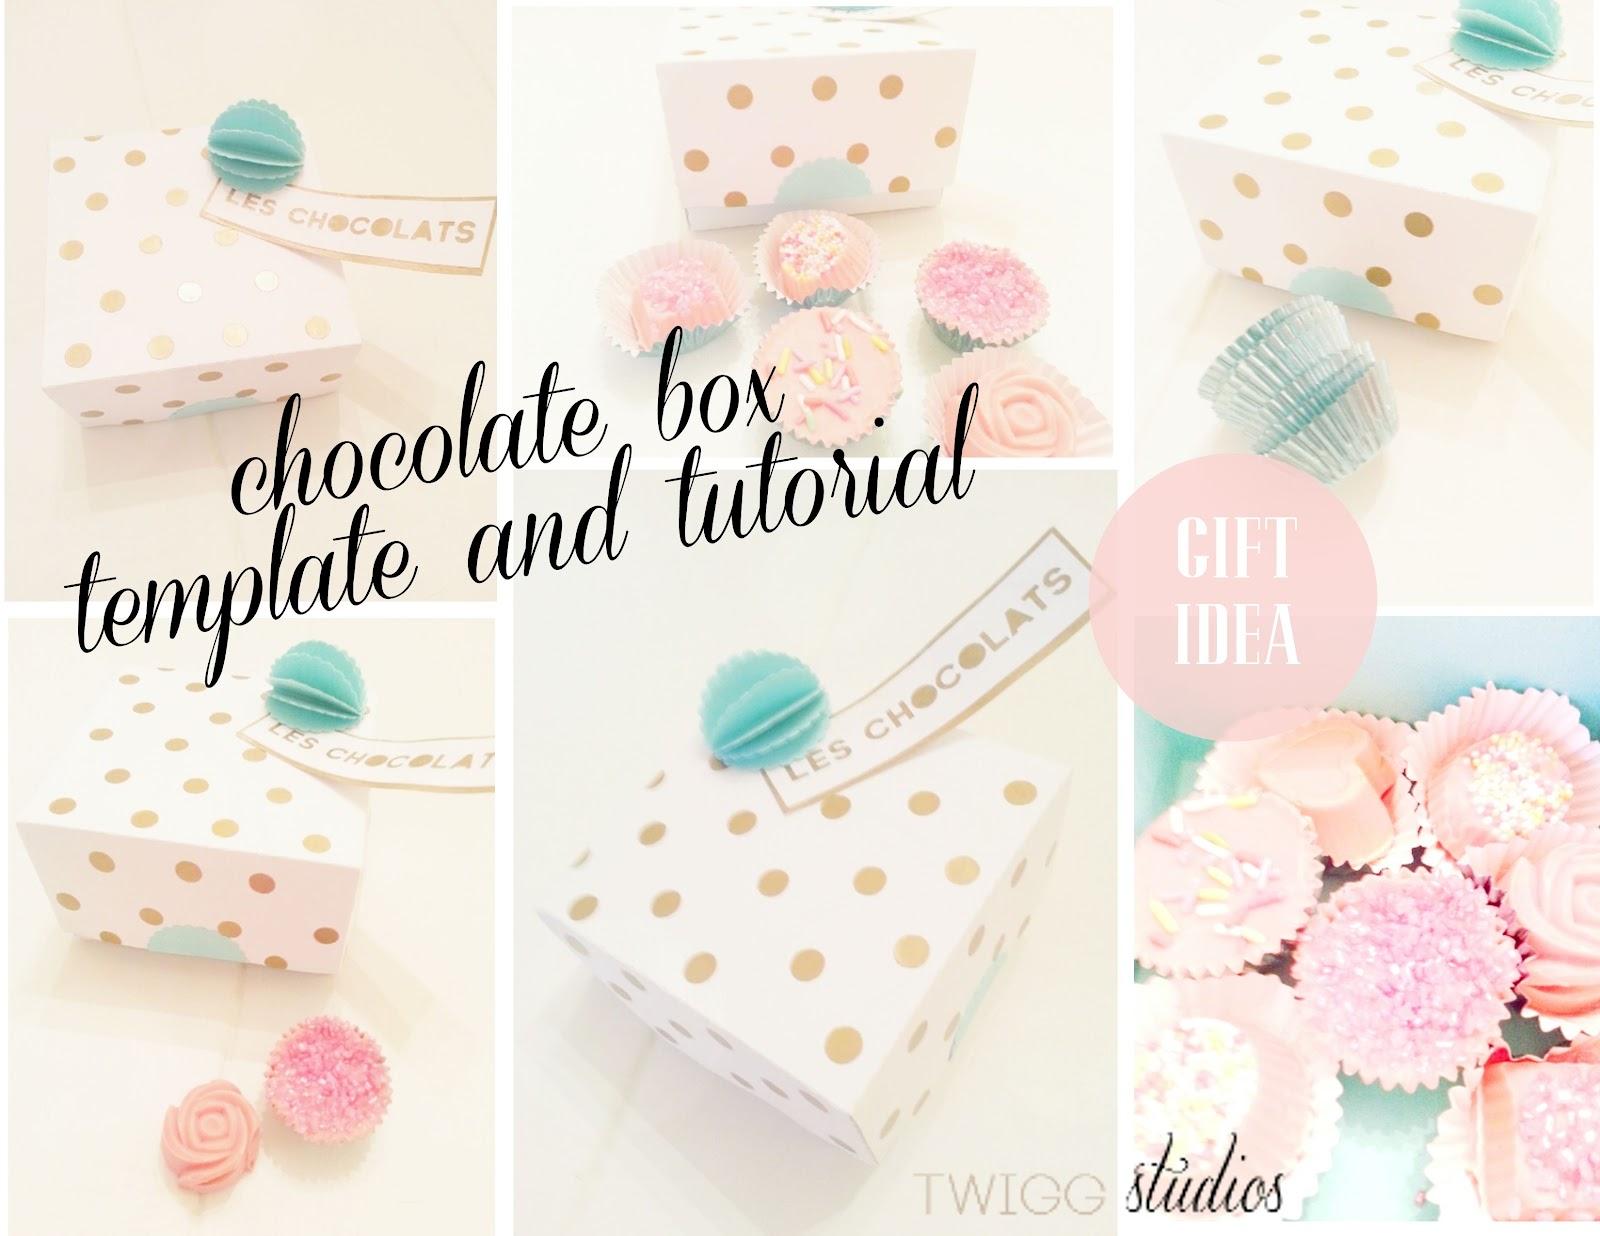 chocolate box template Narconantly